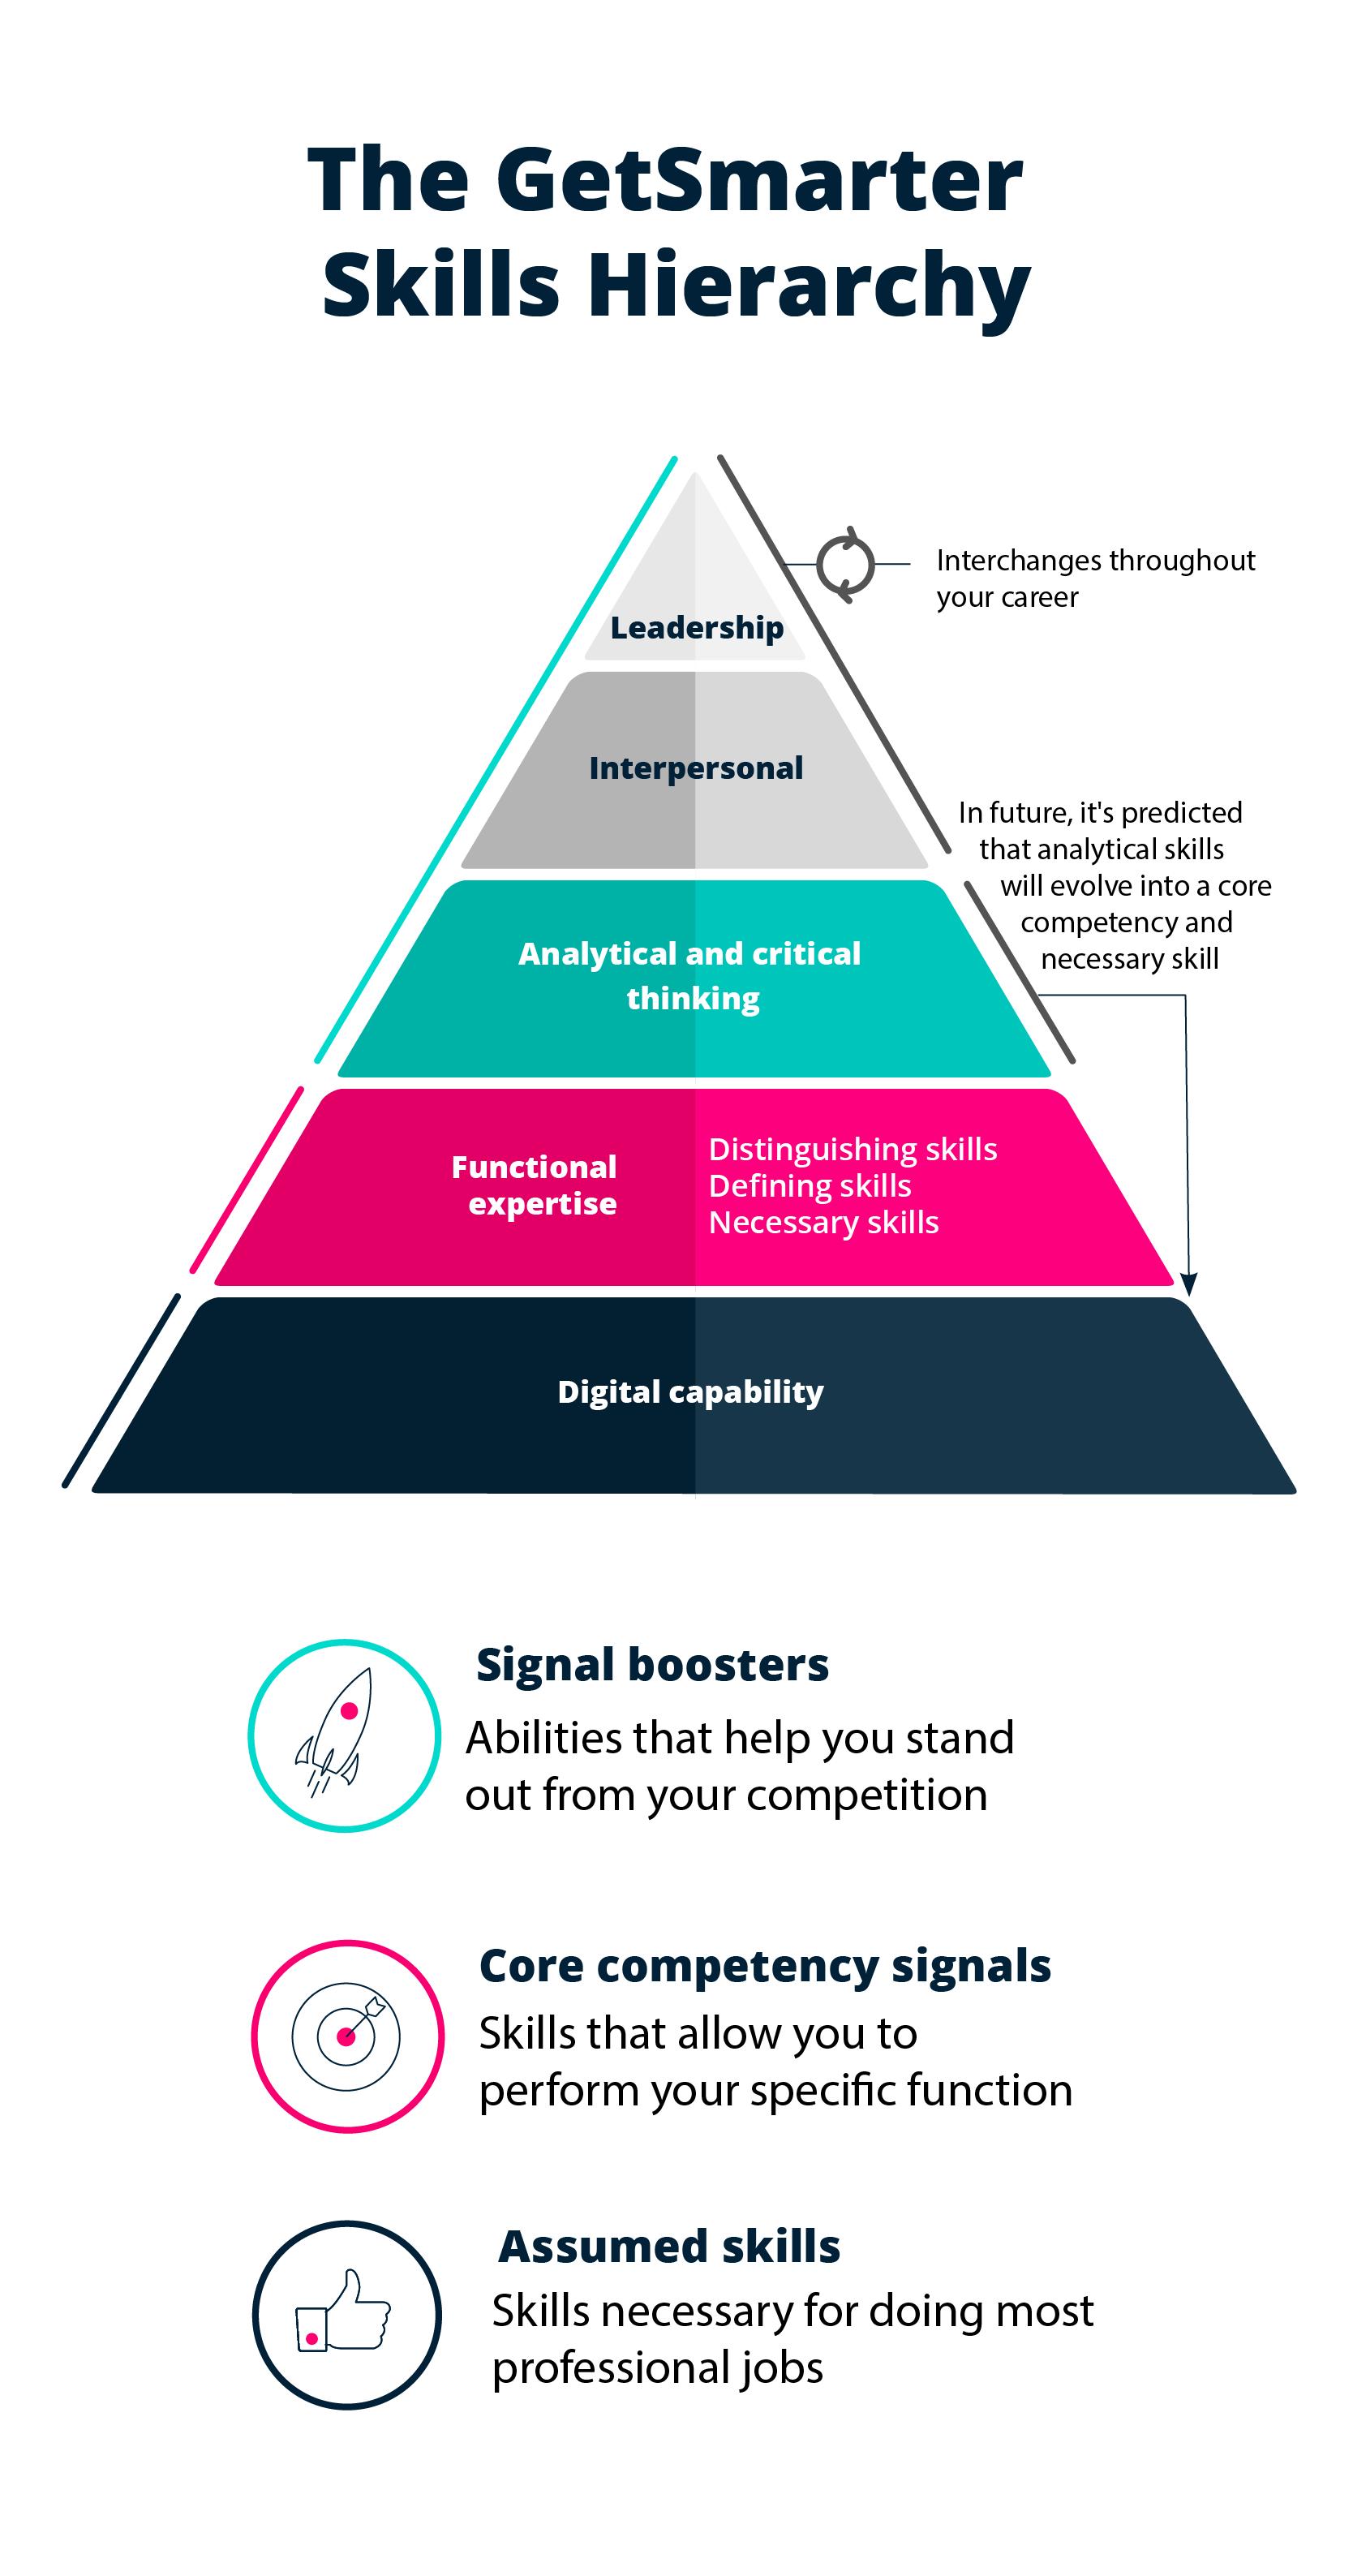 GetSmarter Skills Hierarchy